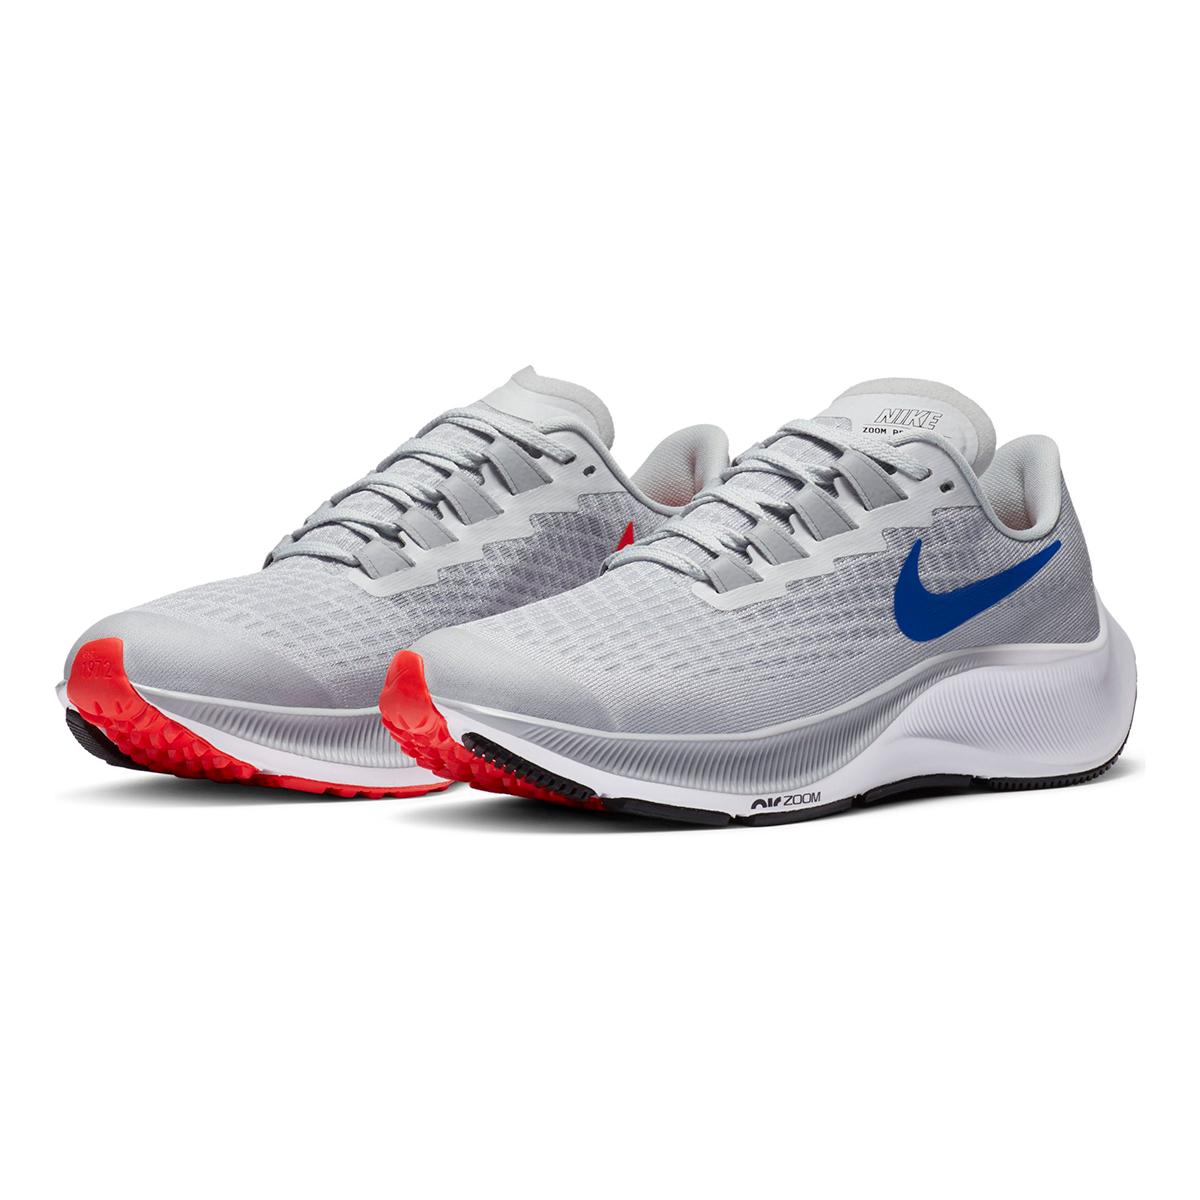 Kid's Nike Air Zoom Pegasus 37 Running Shoe - Color: Pure Platinum/Wolf Grey/Bright Crimson/Racer Blue - Size: 1 - Width: Regular, Pure Platinum/Wolf Grey/Bright Crimson/Racer Blue, large, image 4